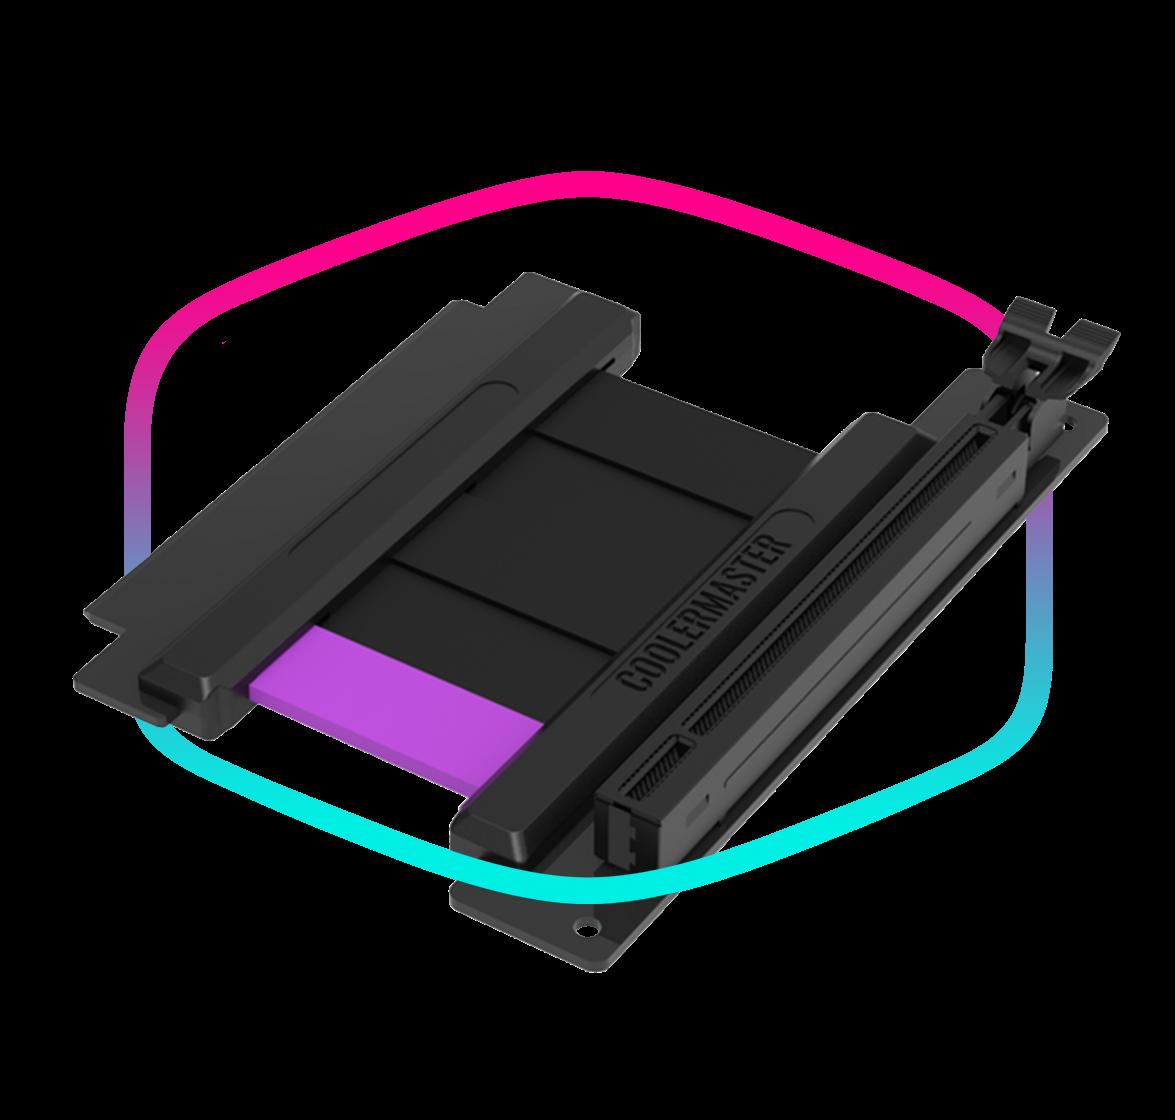 Premium PCIe Gen4 Riser Cable Included